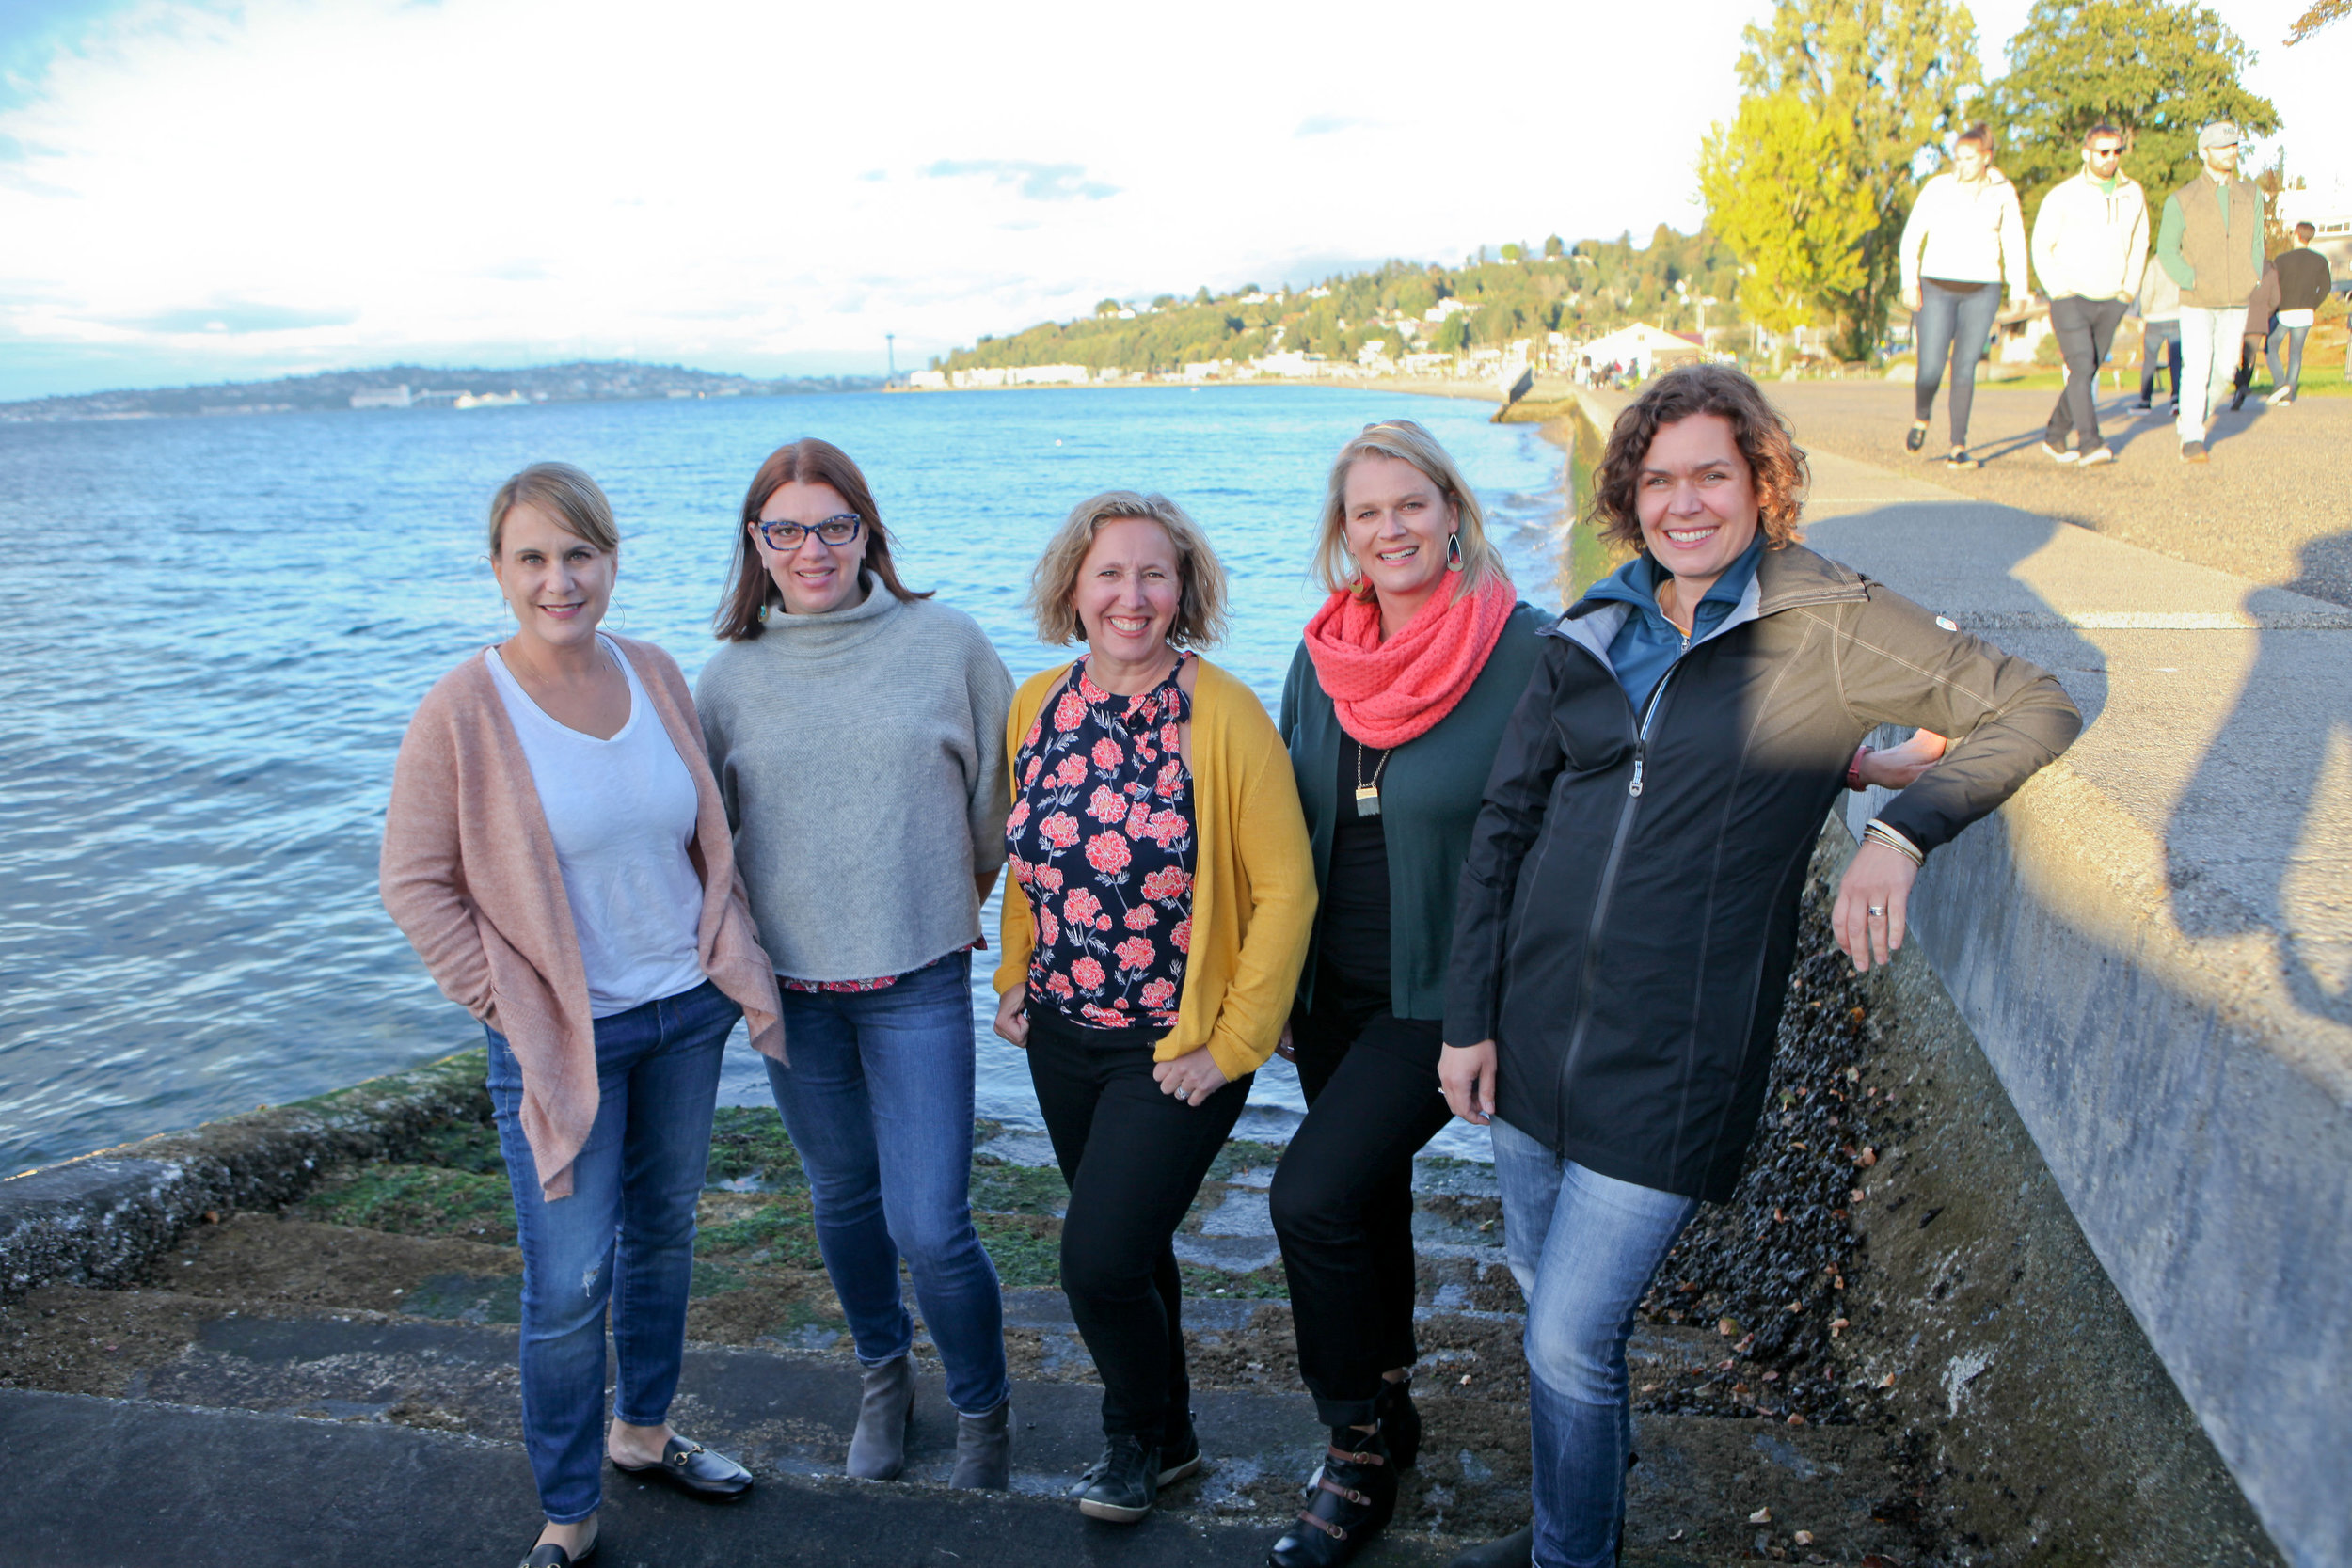 Founding members Rachel Lazar, Robin Graham, Amy Huey, Rachel Hagenson, and Kristen Corning Bedford